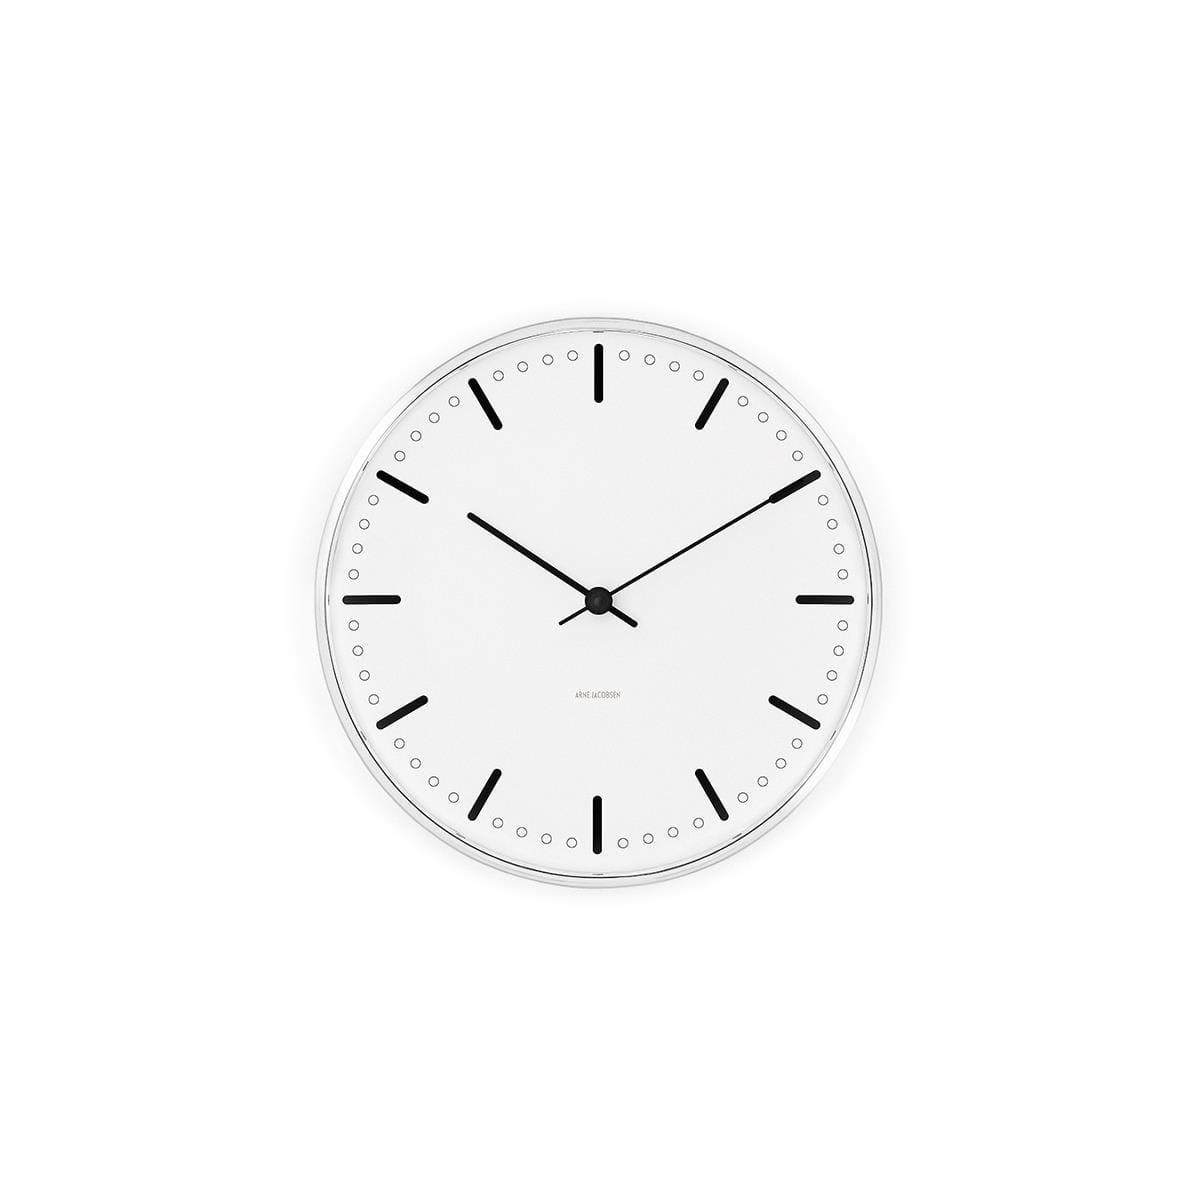 Arne Jacobsen - City Hall Wall Clock 21 cm - White (43631)